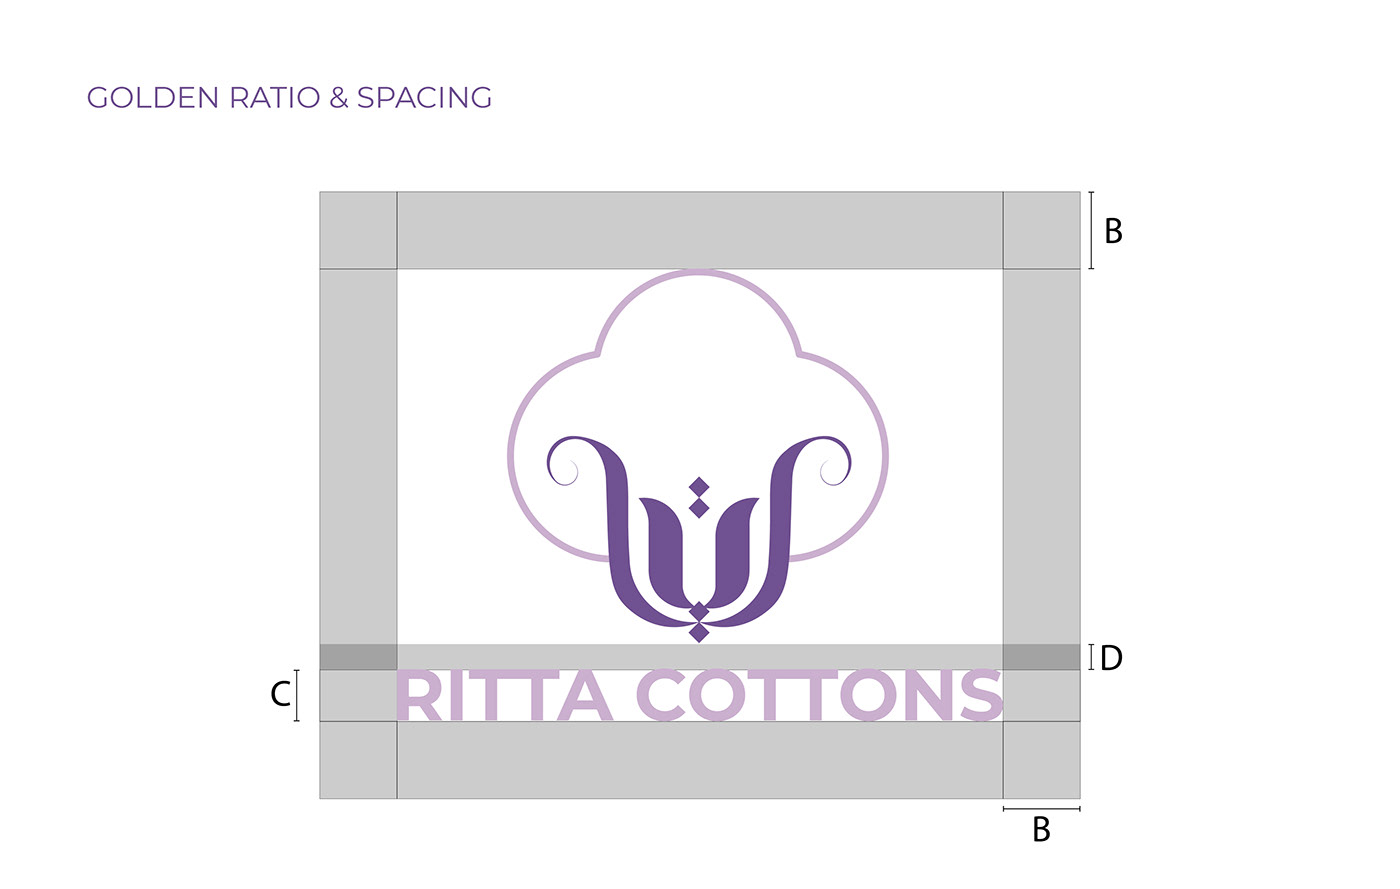 emblem,fashion brand,fashion logo,Icon,iconic logo,identity,logo,Logo Design,logos,logotypes